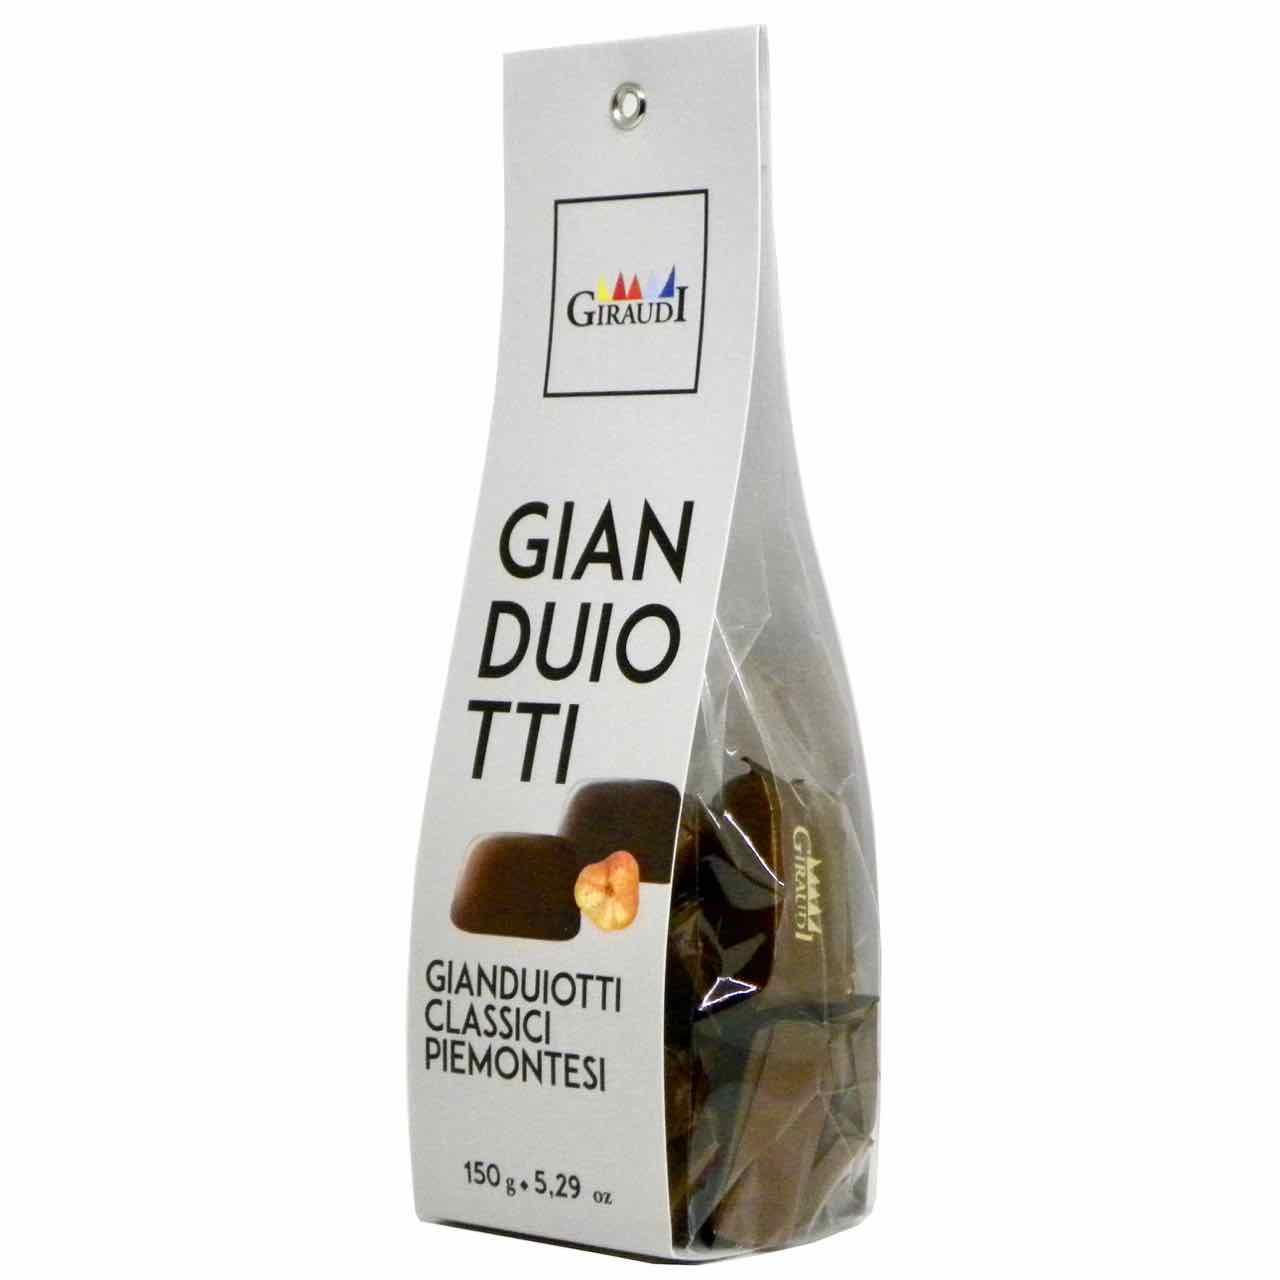 Gianduiotti fondenti Giraudi lato – Gustorotondo – spesa online –  Gustorotondo online shop – i migliori cibi online – vendita online dei migliori cibi italiani artigianali